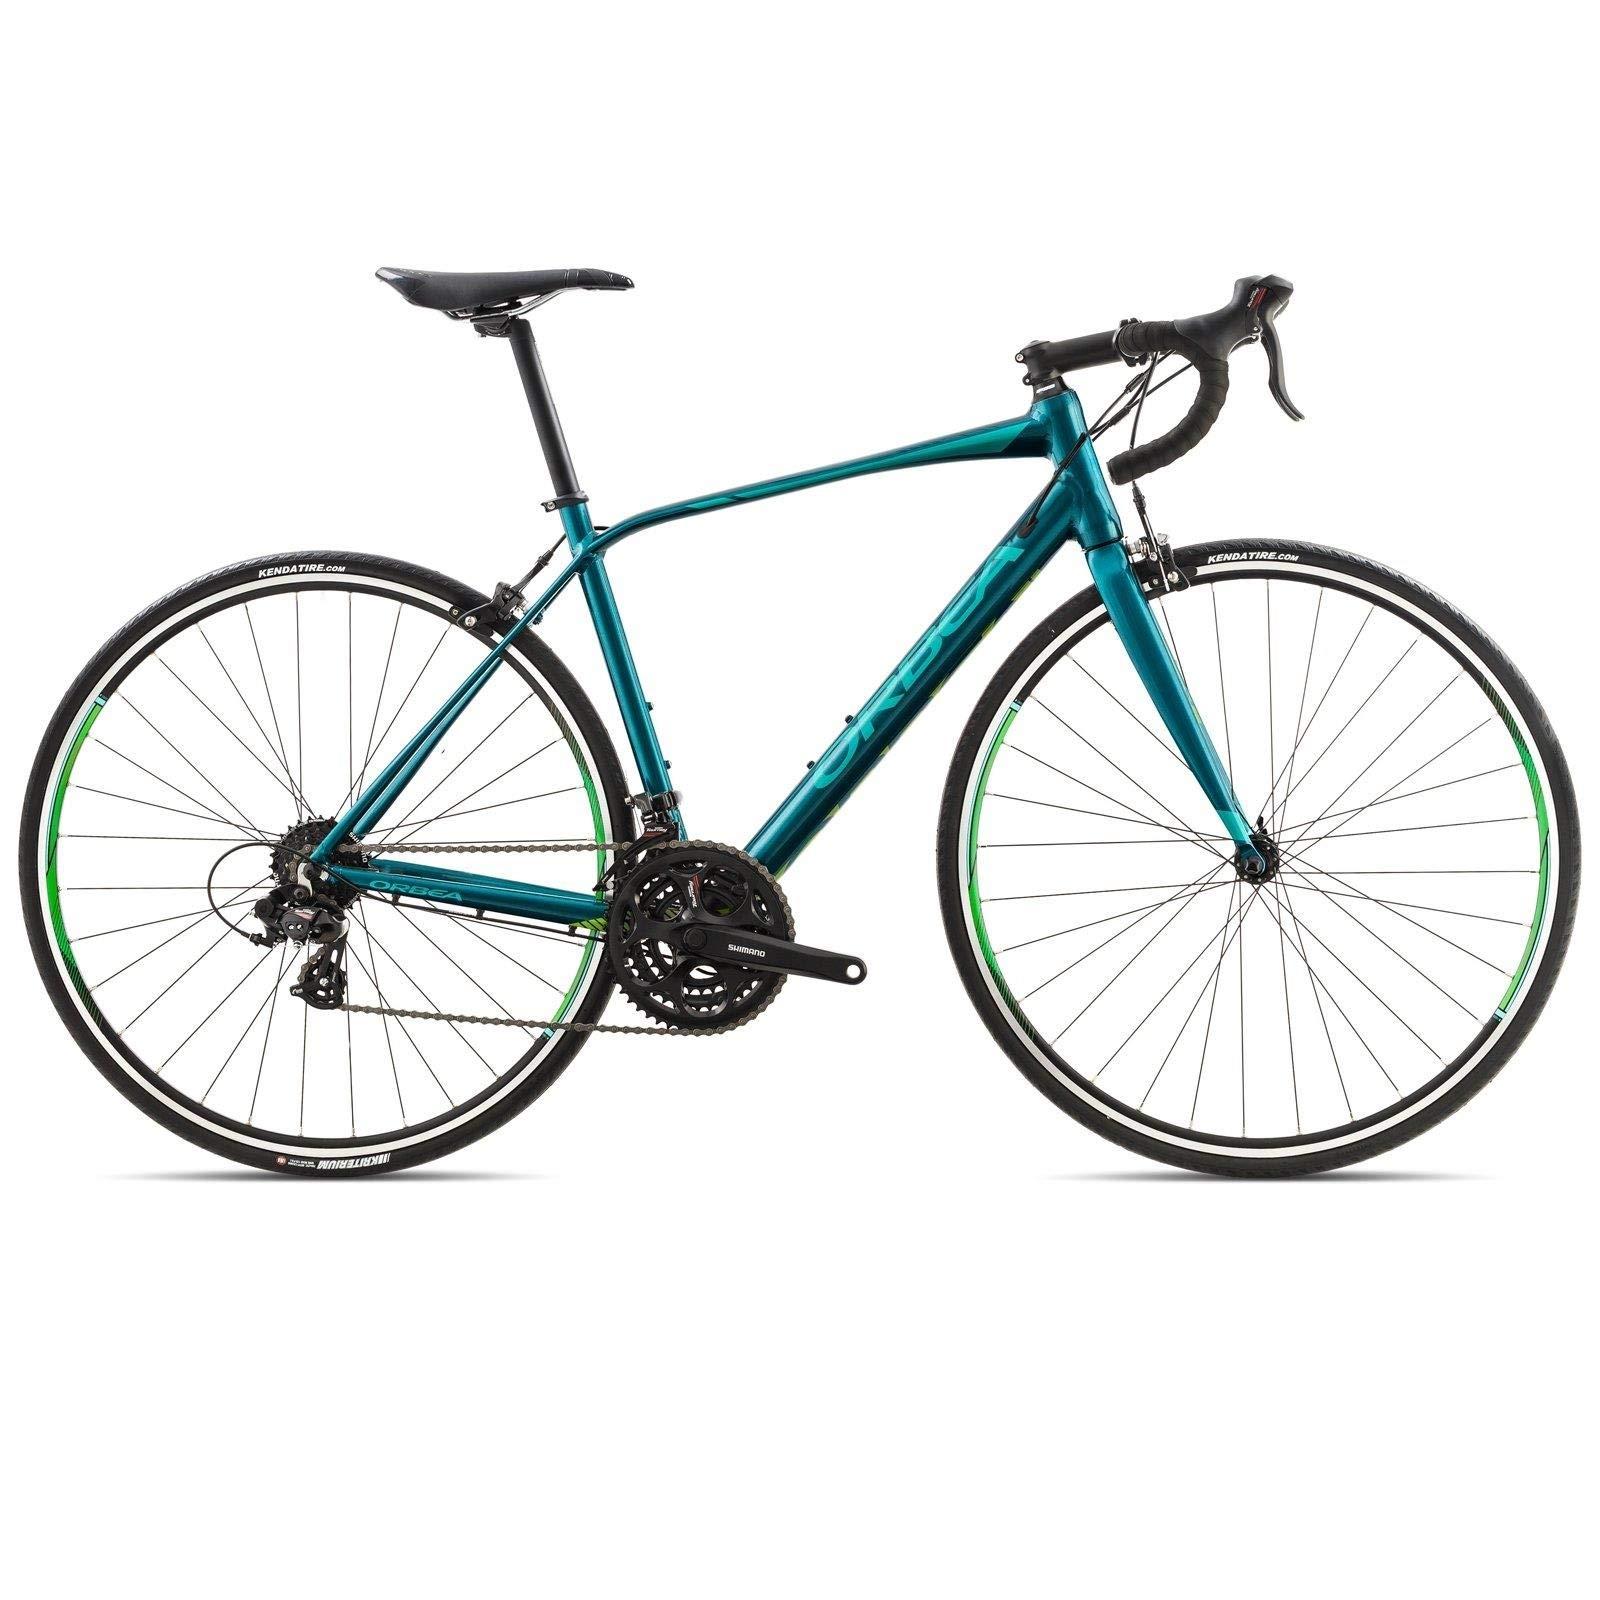 Orbea Avant H70 Carreras 7 velocidades bicicleta Bike Aluminio ...